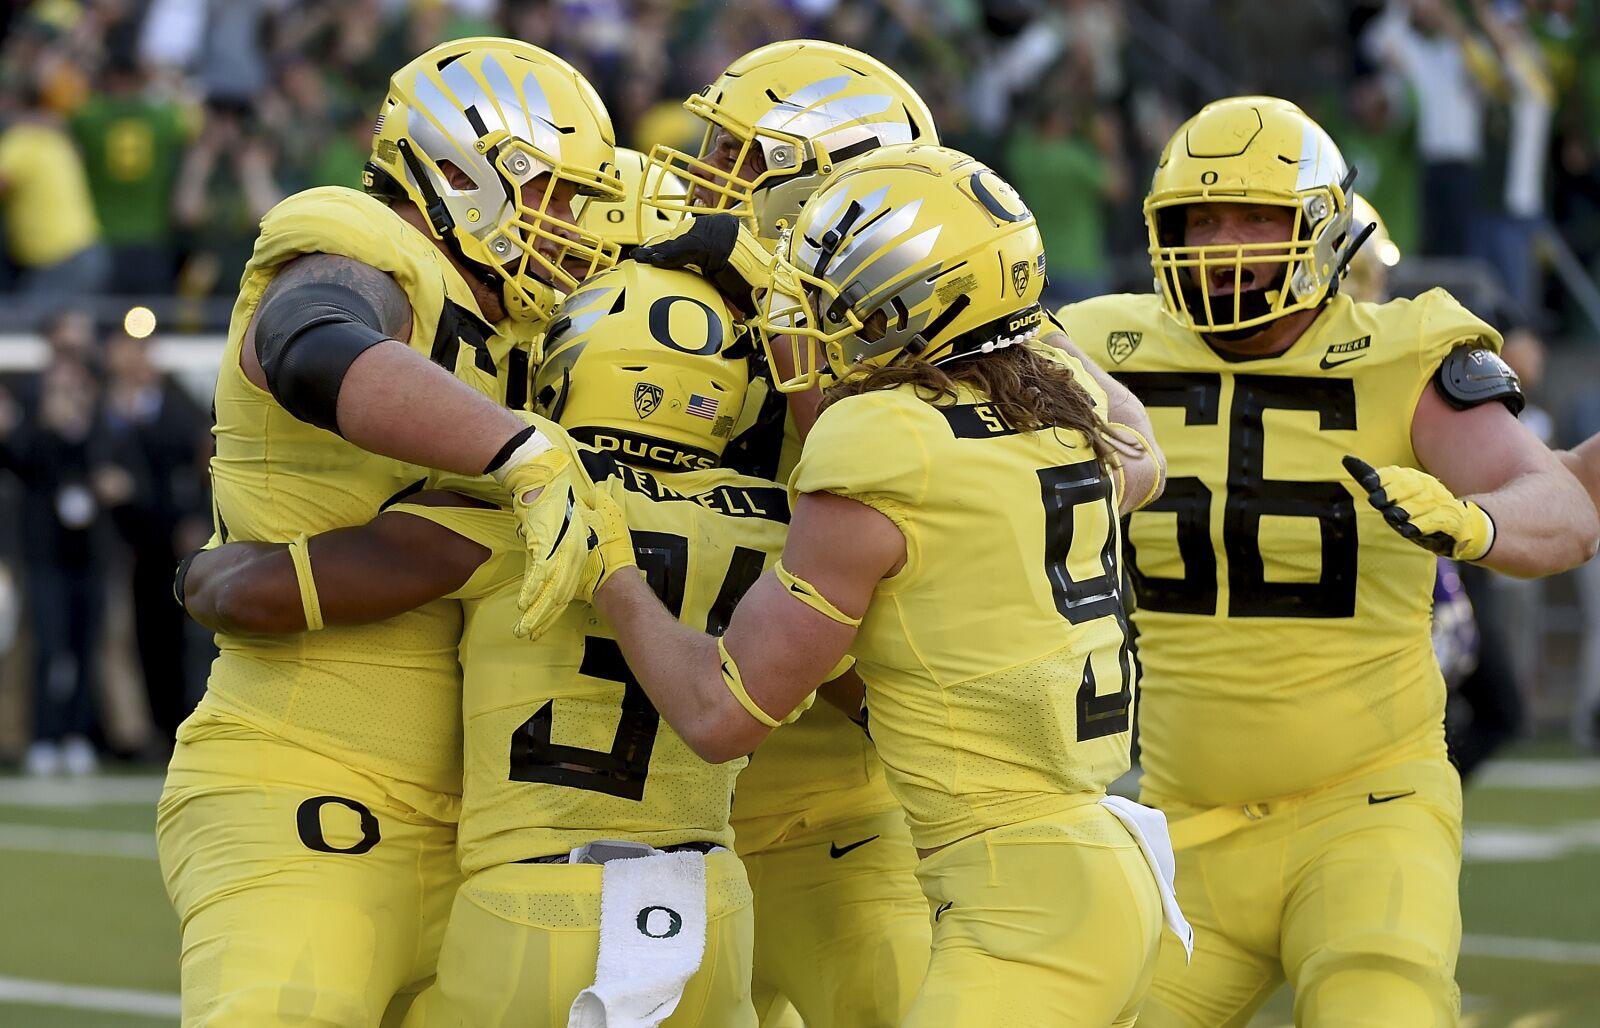 Oregon Football: 5 takeaways from 2019 spring game